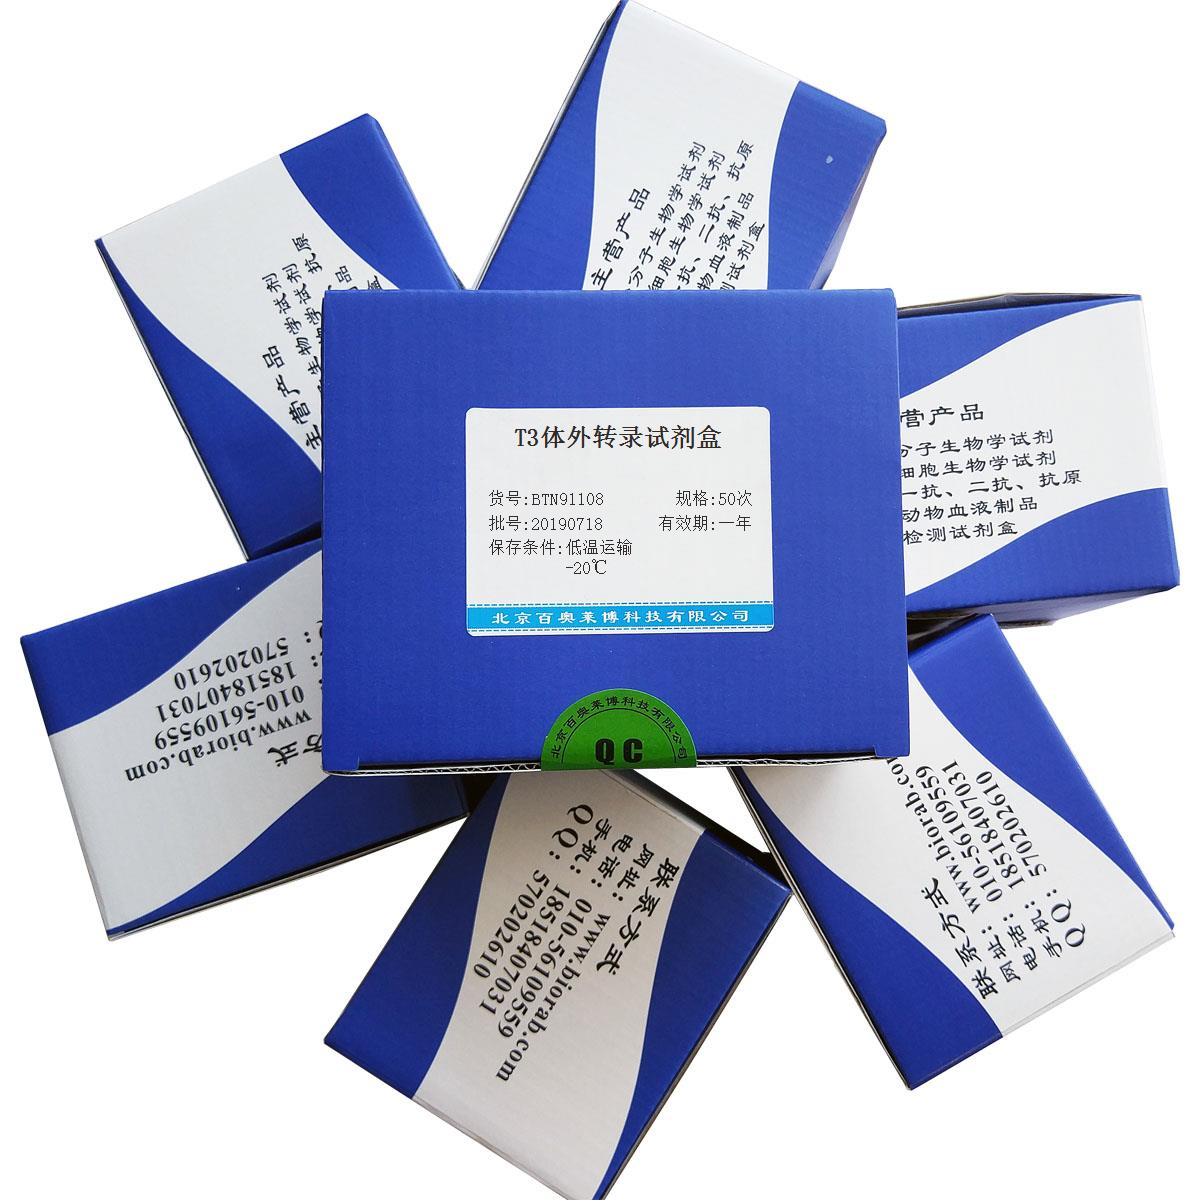 T3体外转录试剂盒北京品牌